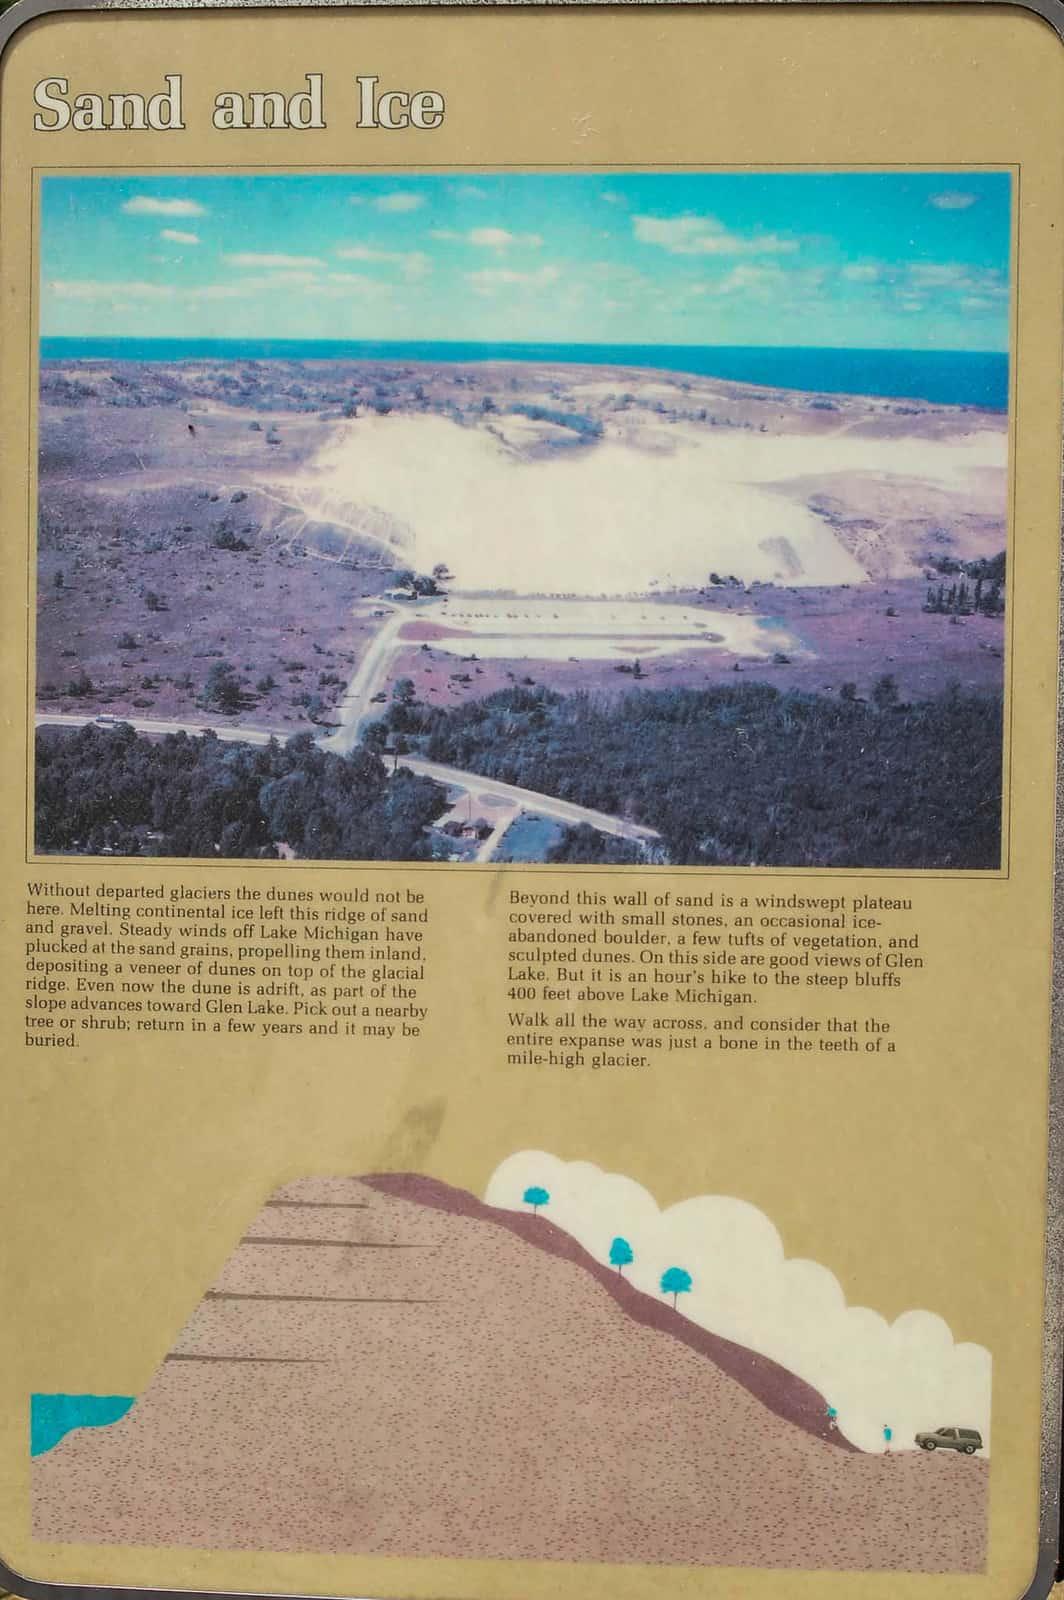 history of Sleeping Bear Dunes in Michigan